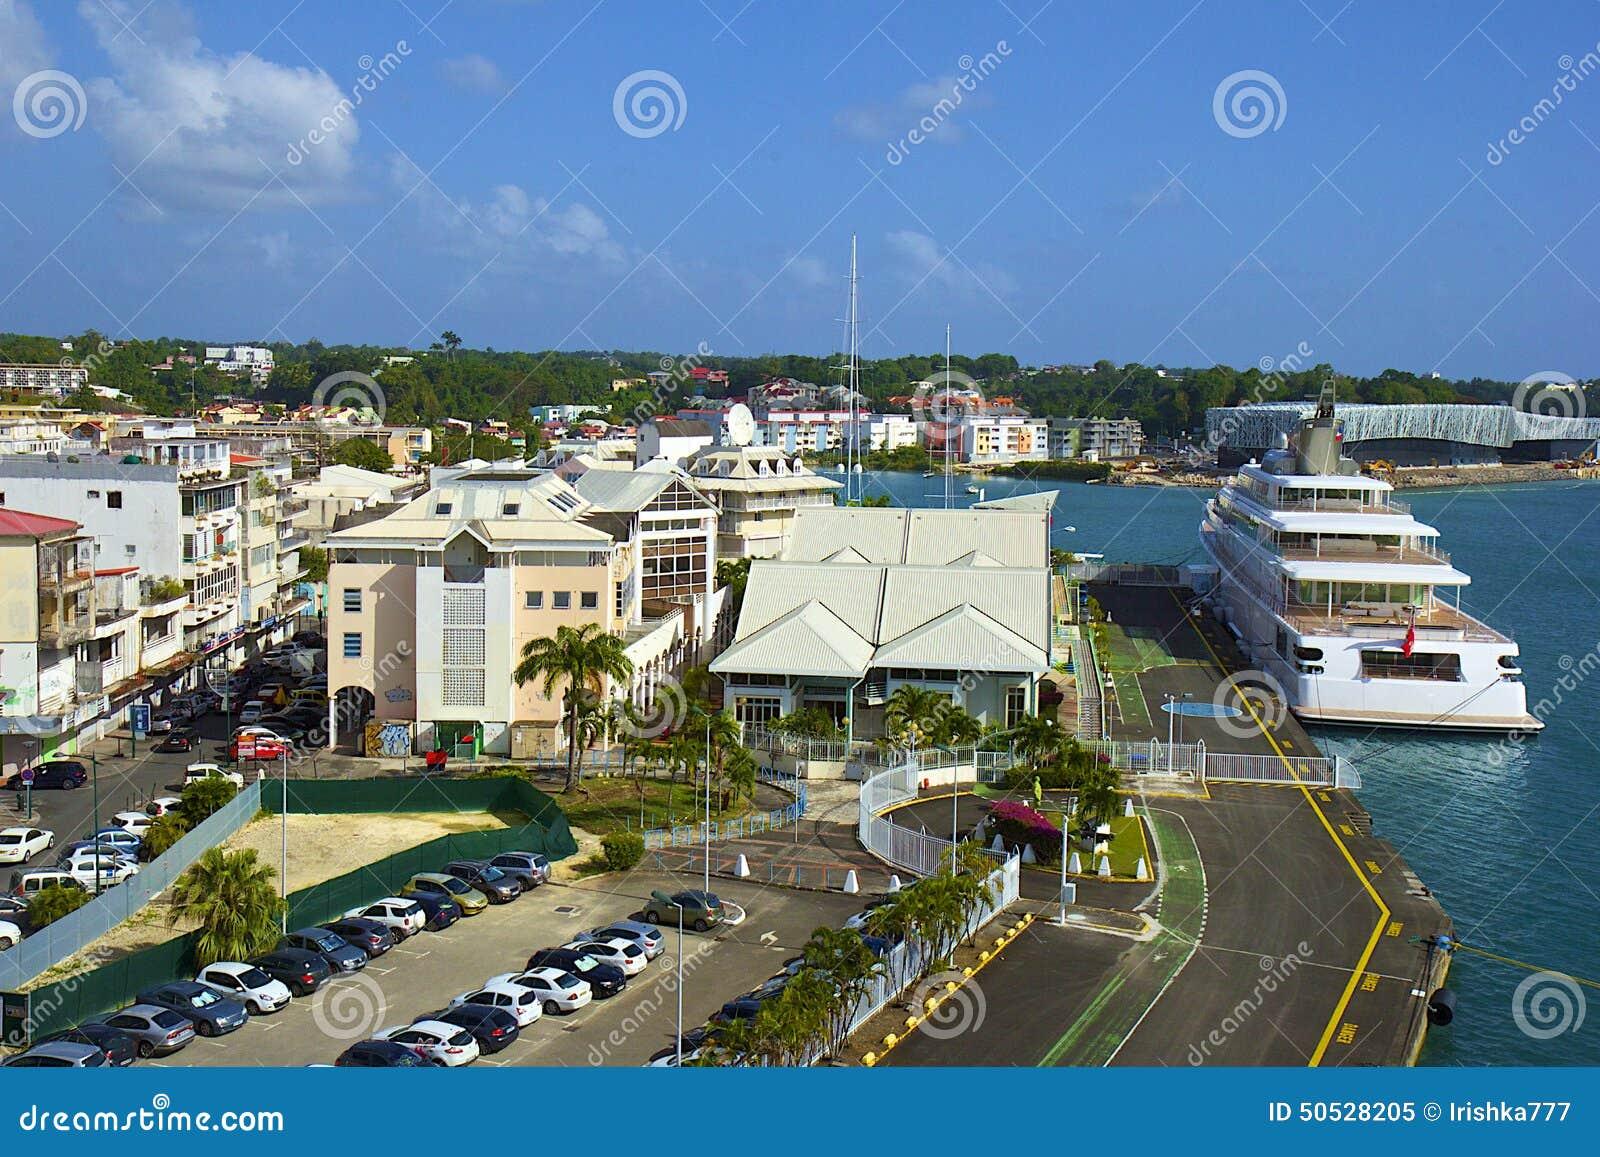 Mulheres Sozinhas Capital Guadeloupe-7095